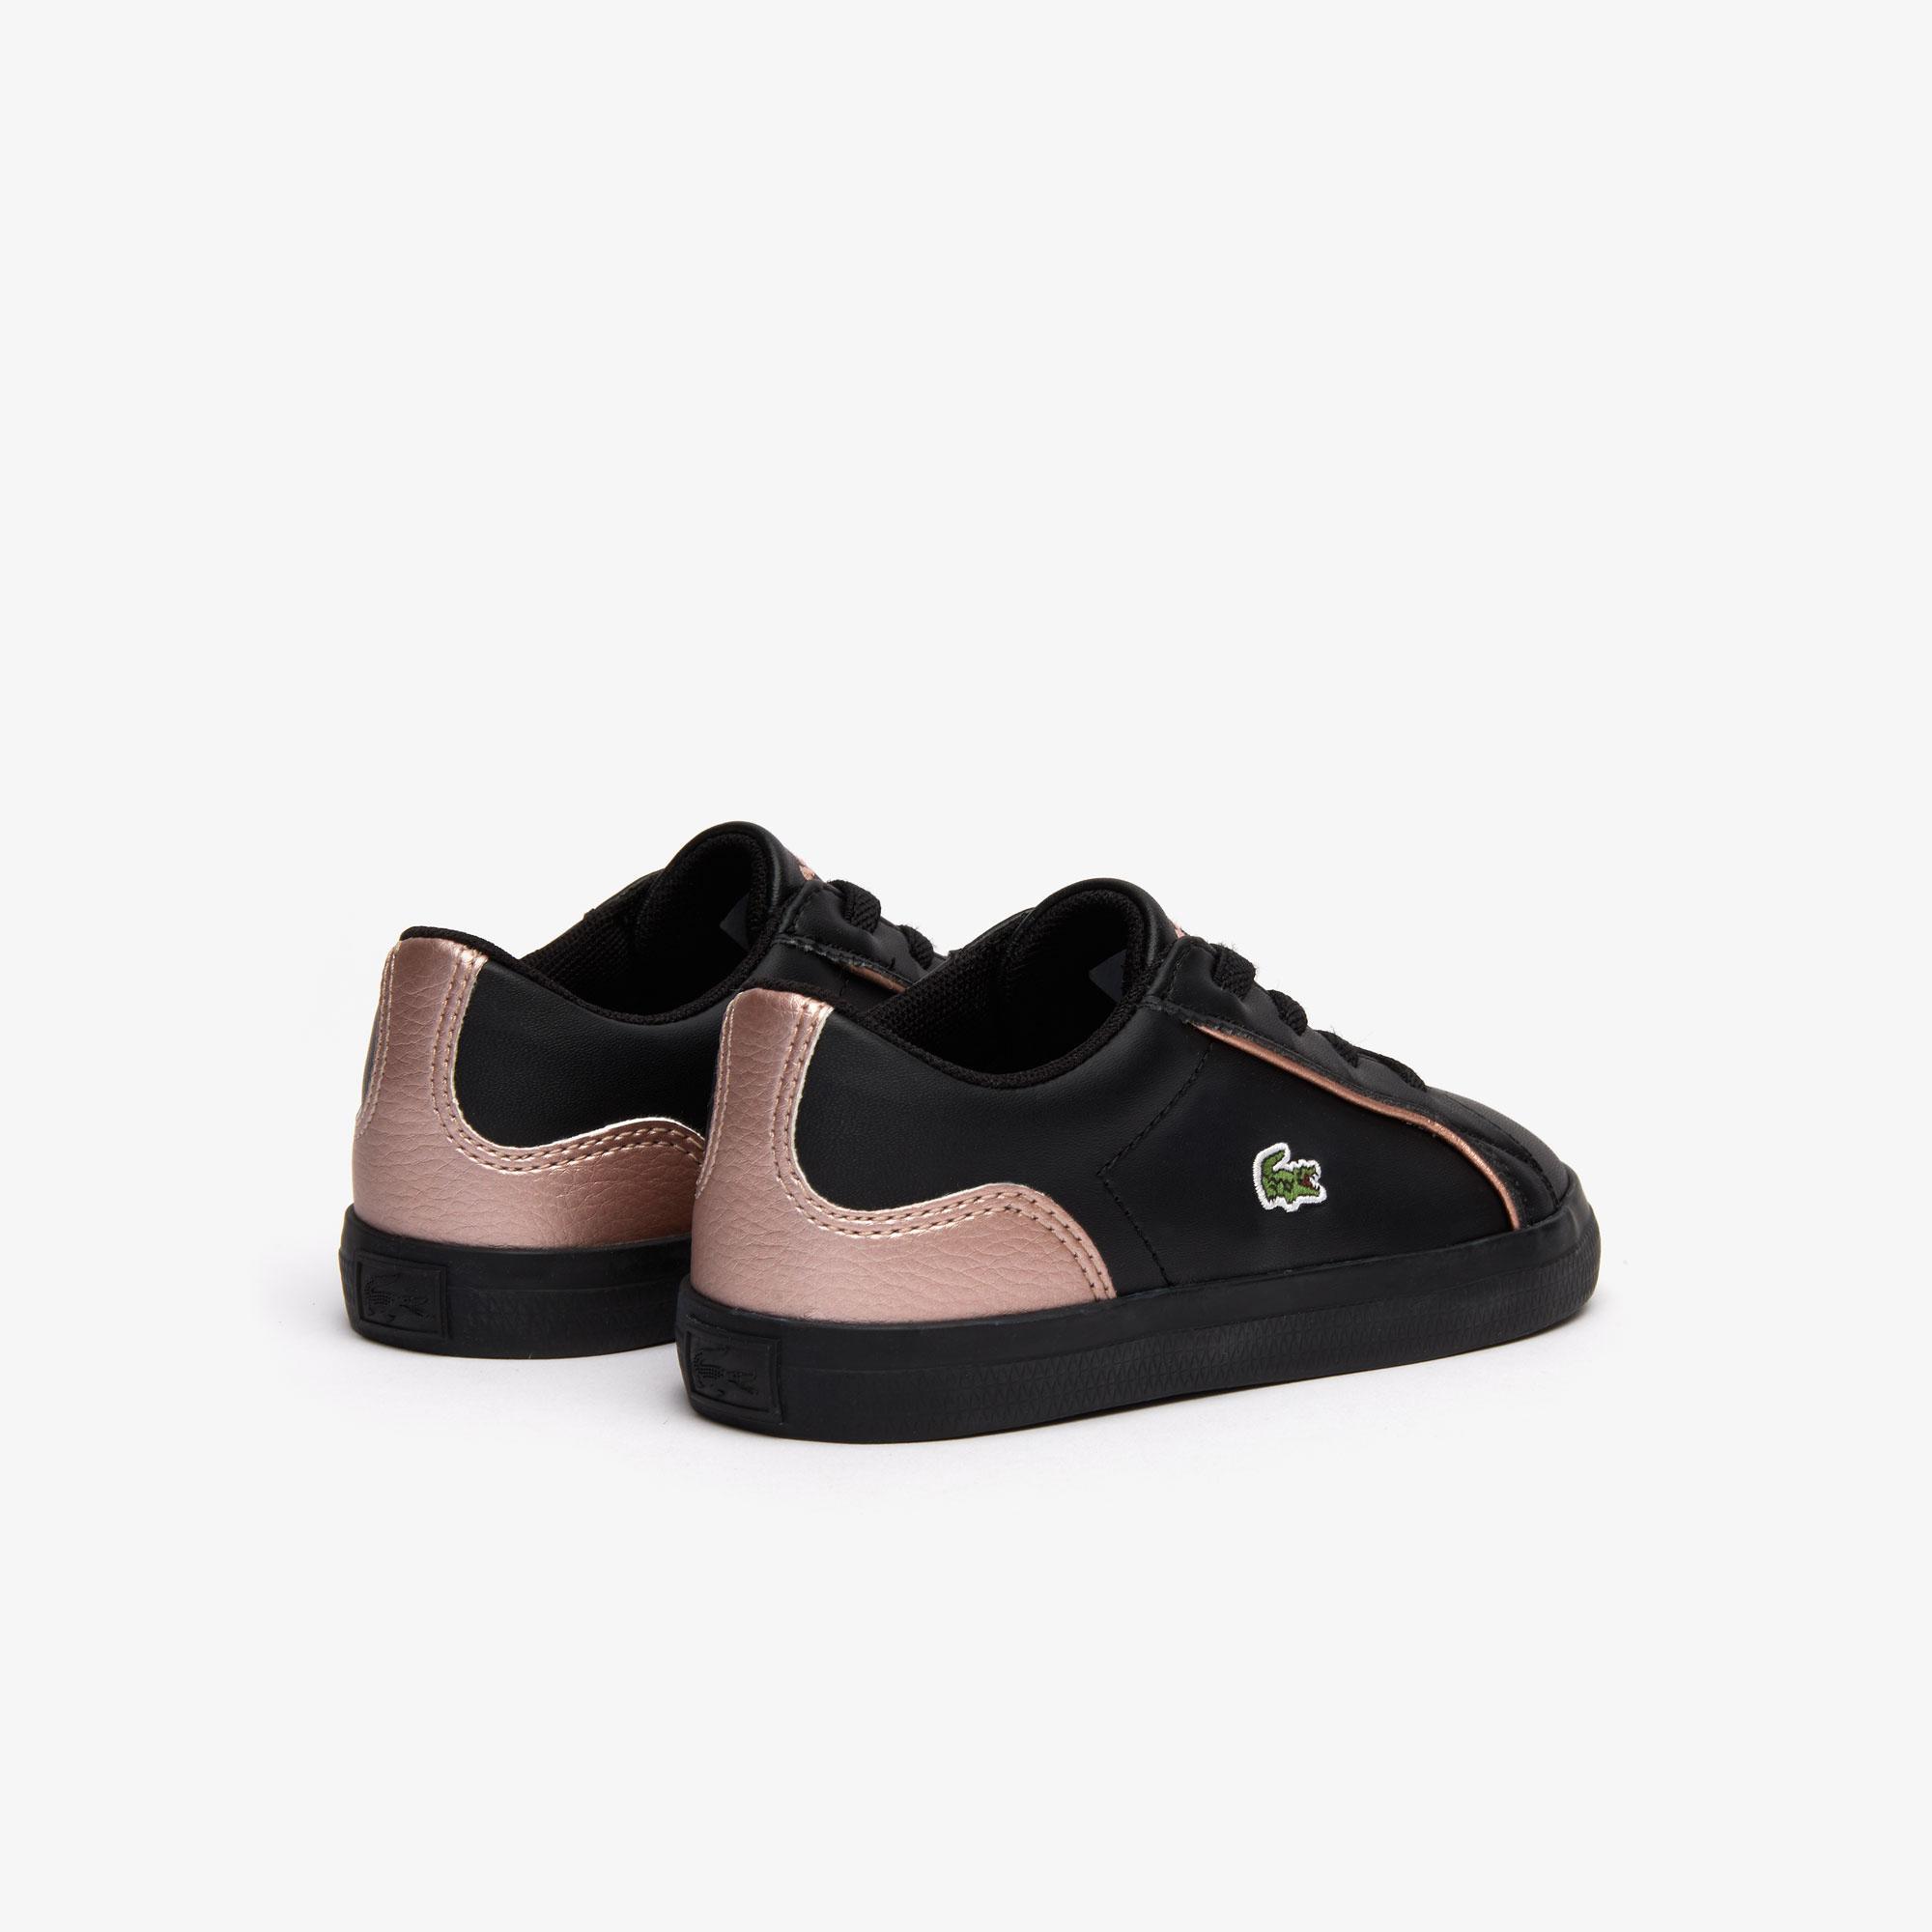 Lacoste Lerond 319 2 Cui Çocuk Siyah - Pembe Casual Ayakkabı